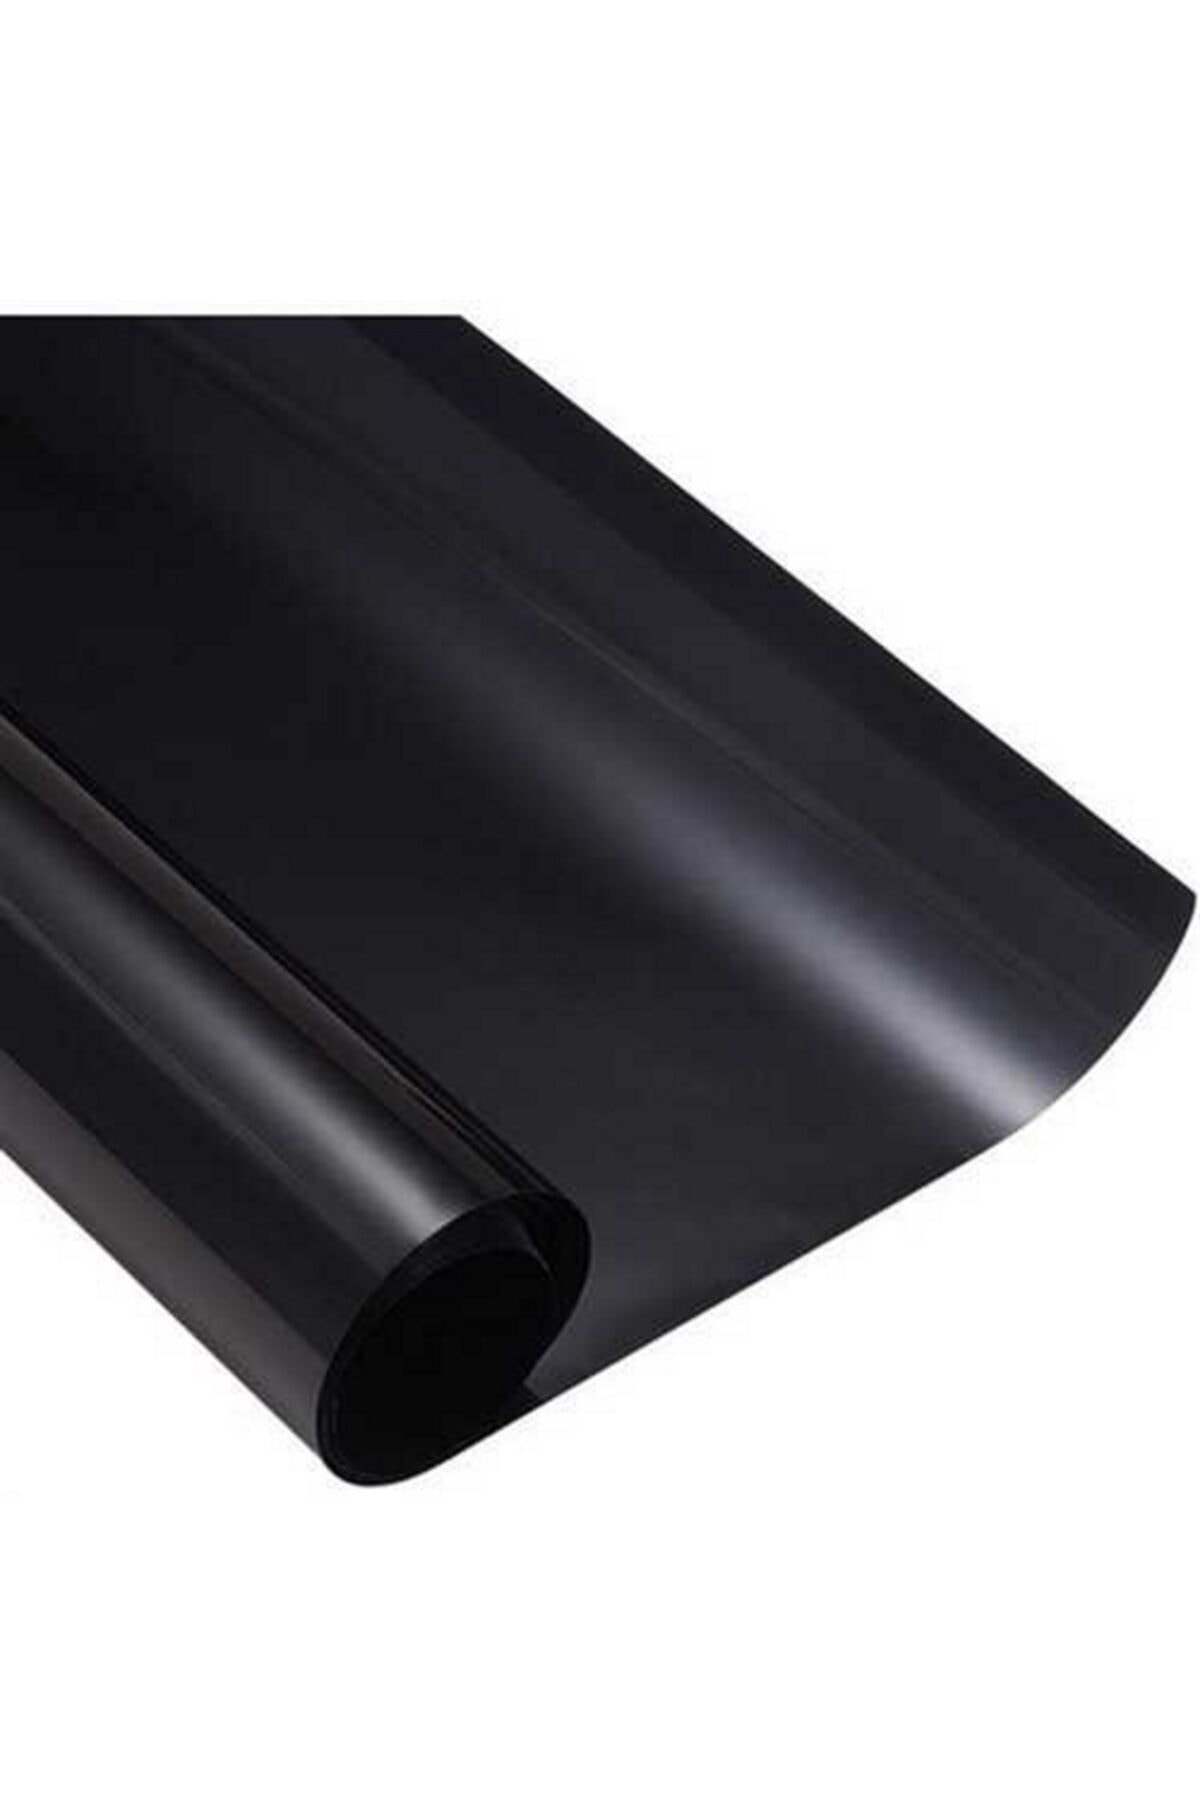 Oscar Tp Cam Filmi Normal 6mt X 50cm Black 2